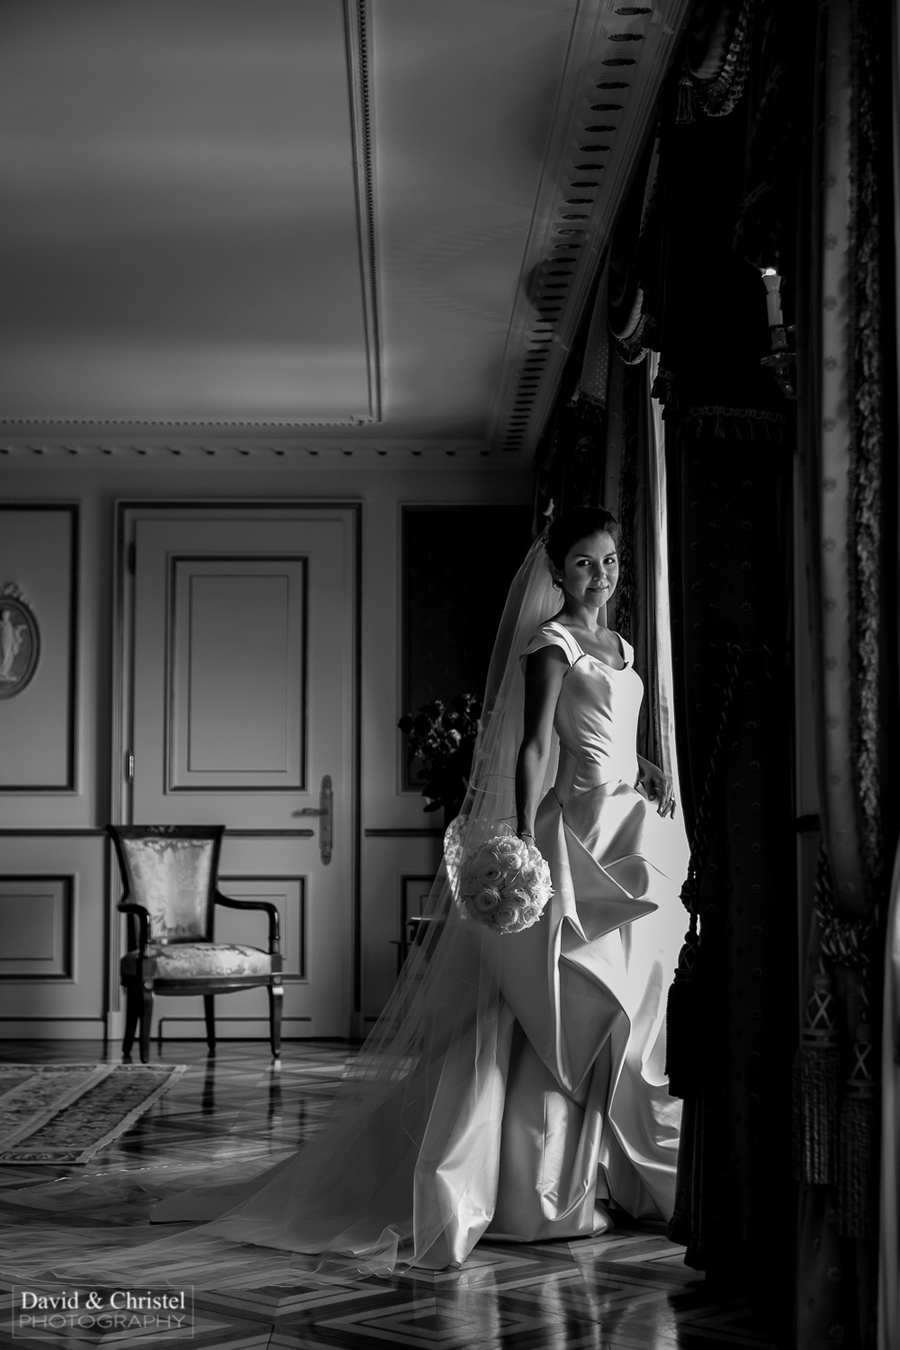 photographe mariage lausanne 09